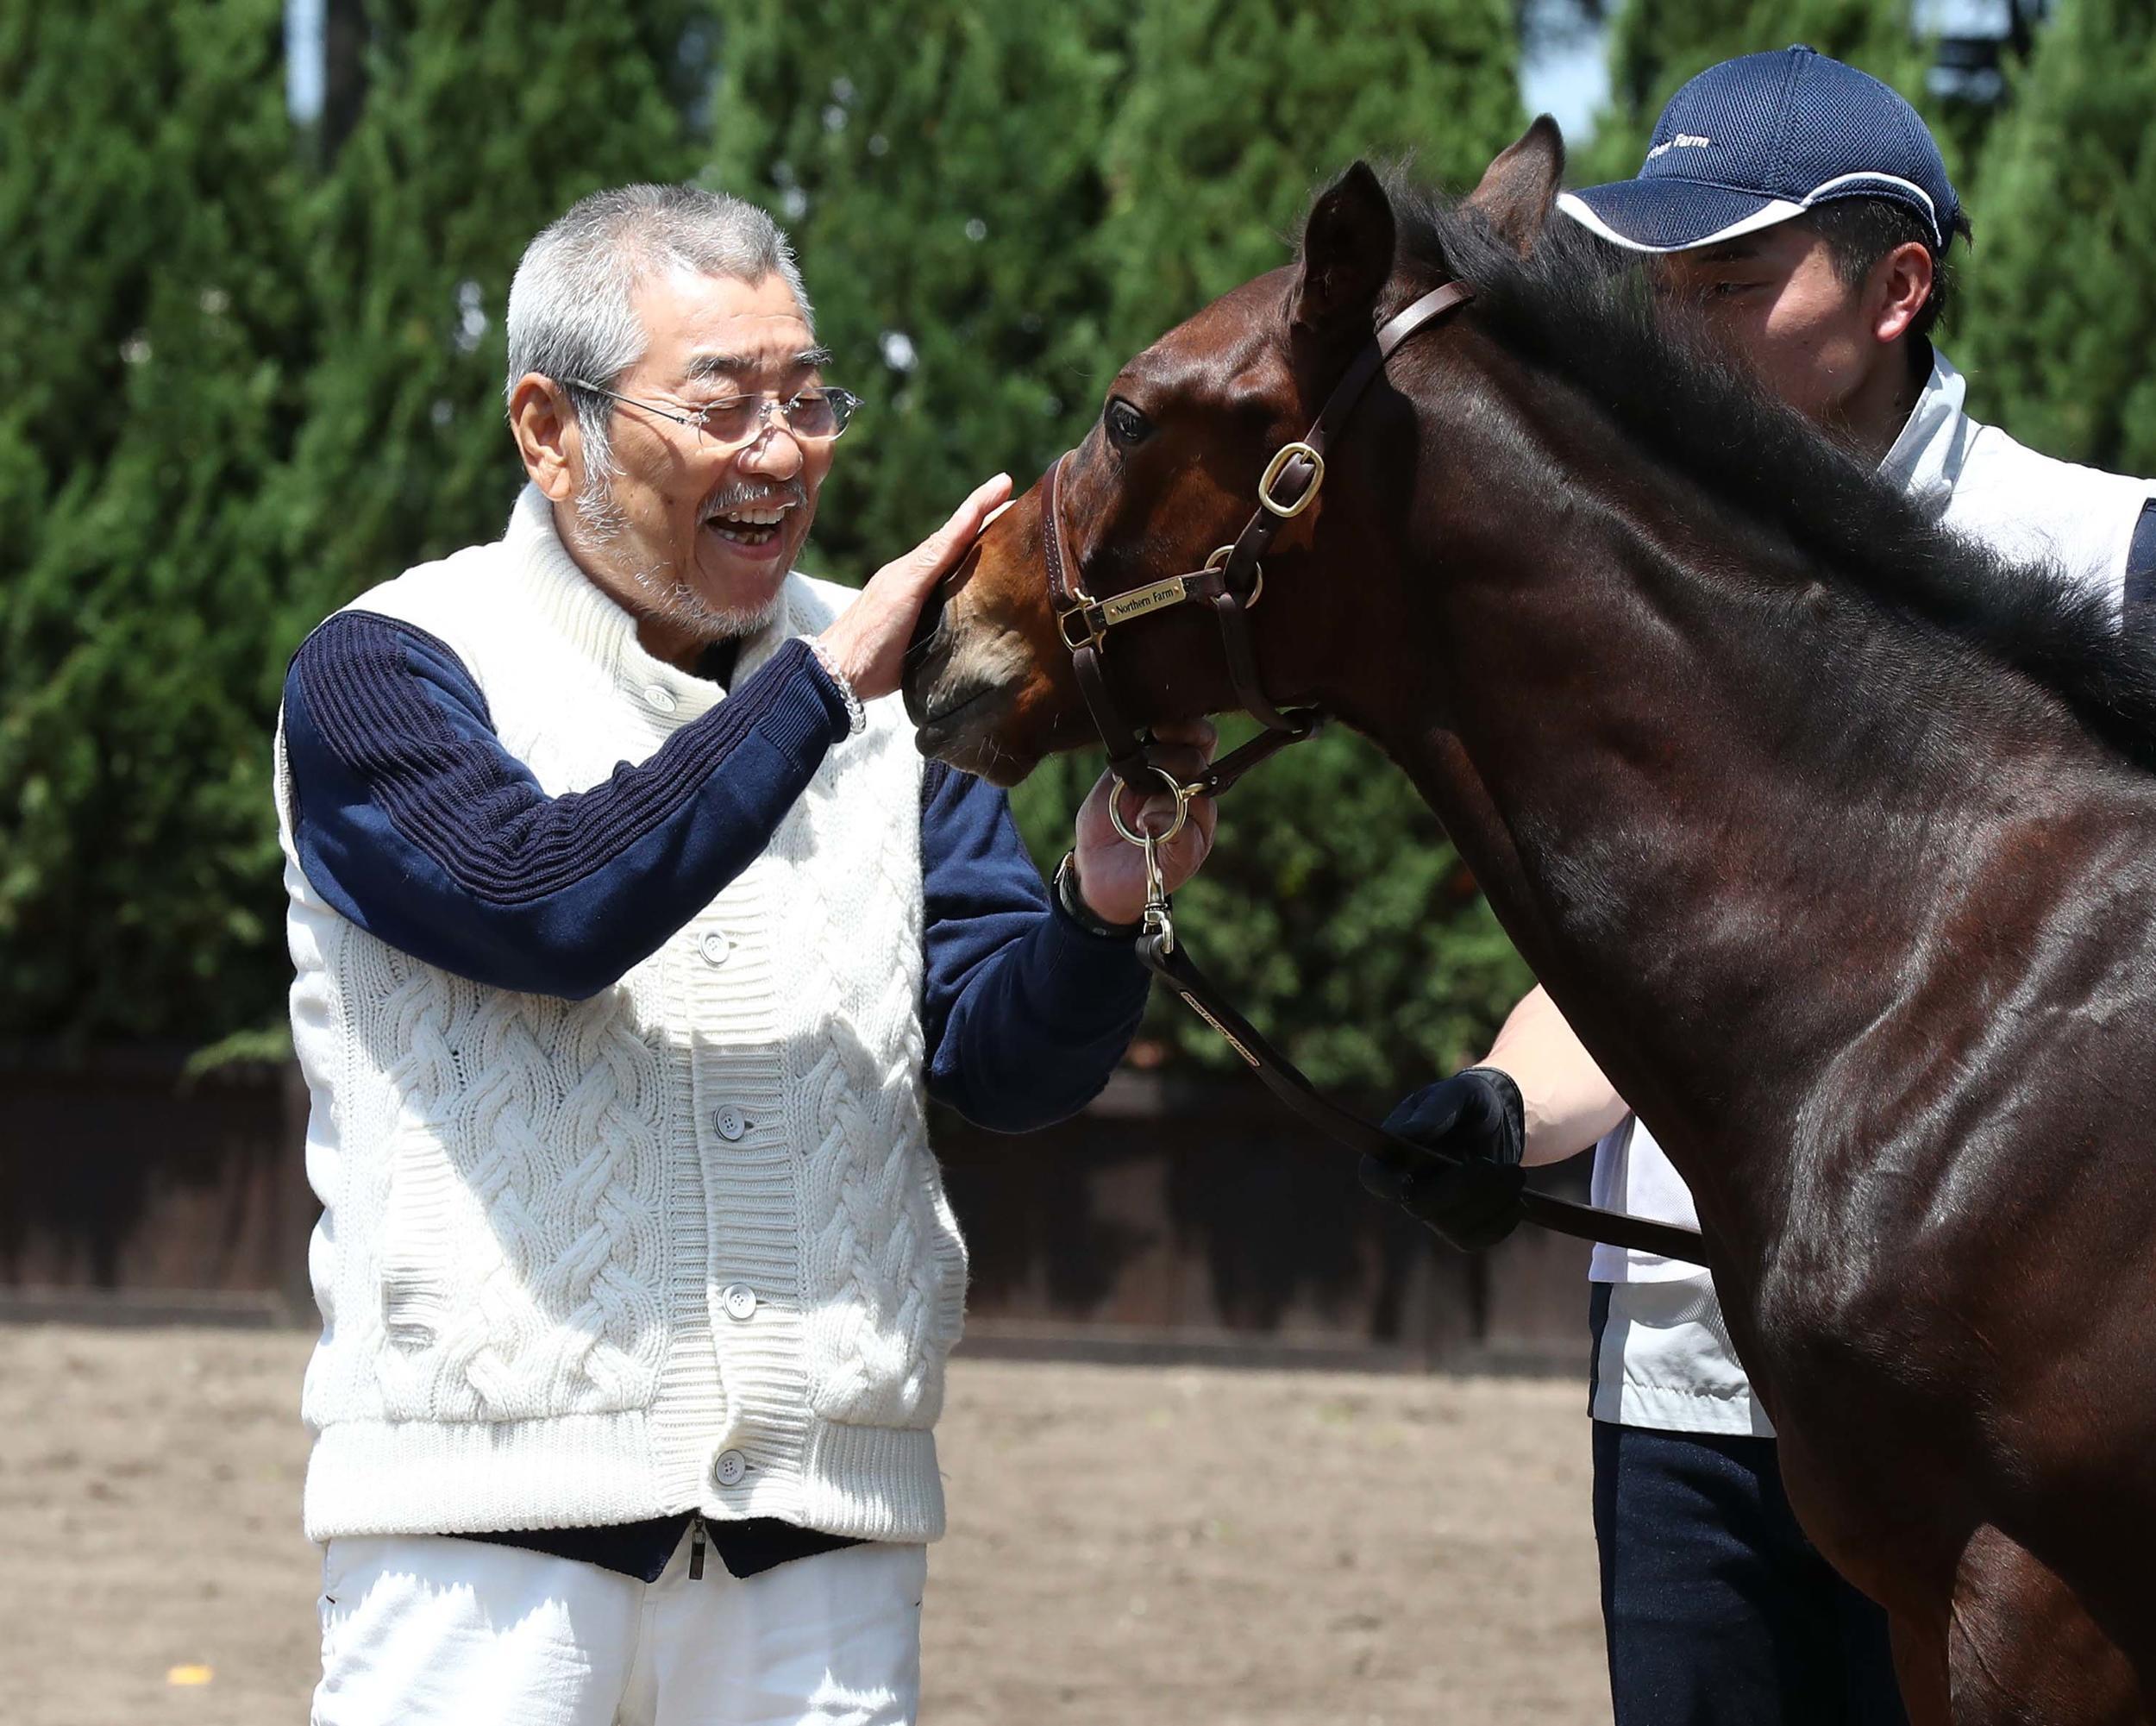 mnewsplus 1562665925 5201 - ディープインパクト産駒 4億7千万円で落札・・・1億円を超える高額馬が相次ぎ、競走馬セール活況